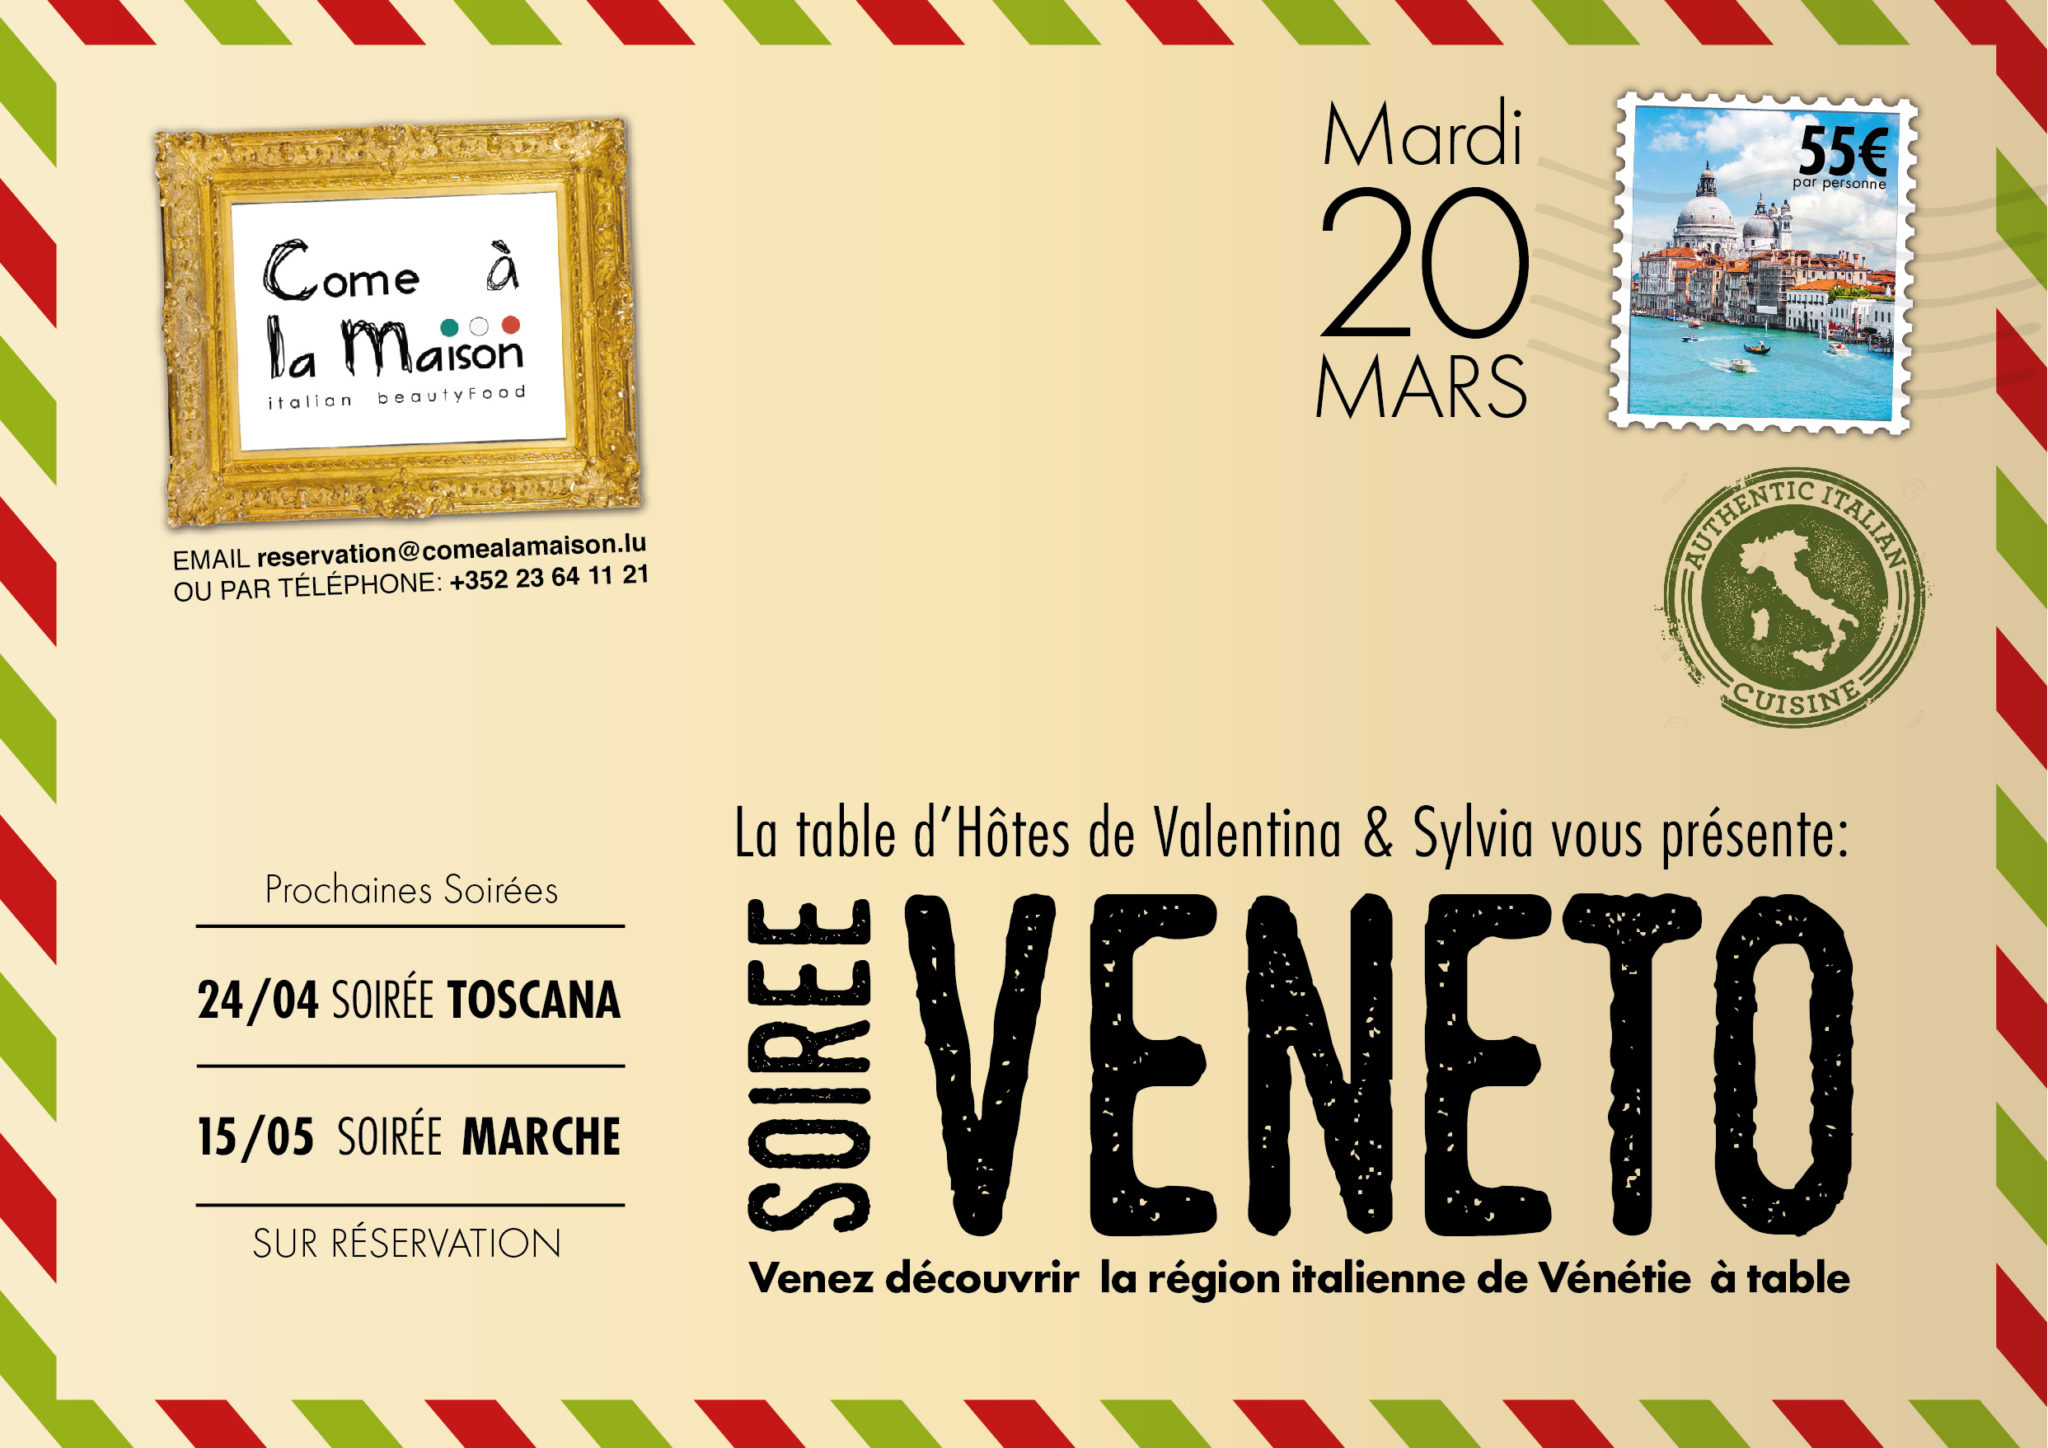 Soirée Veneto – Table d'Hôtes de Valentina & Sylvia